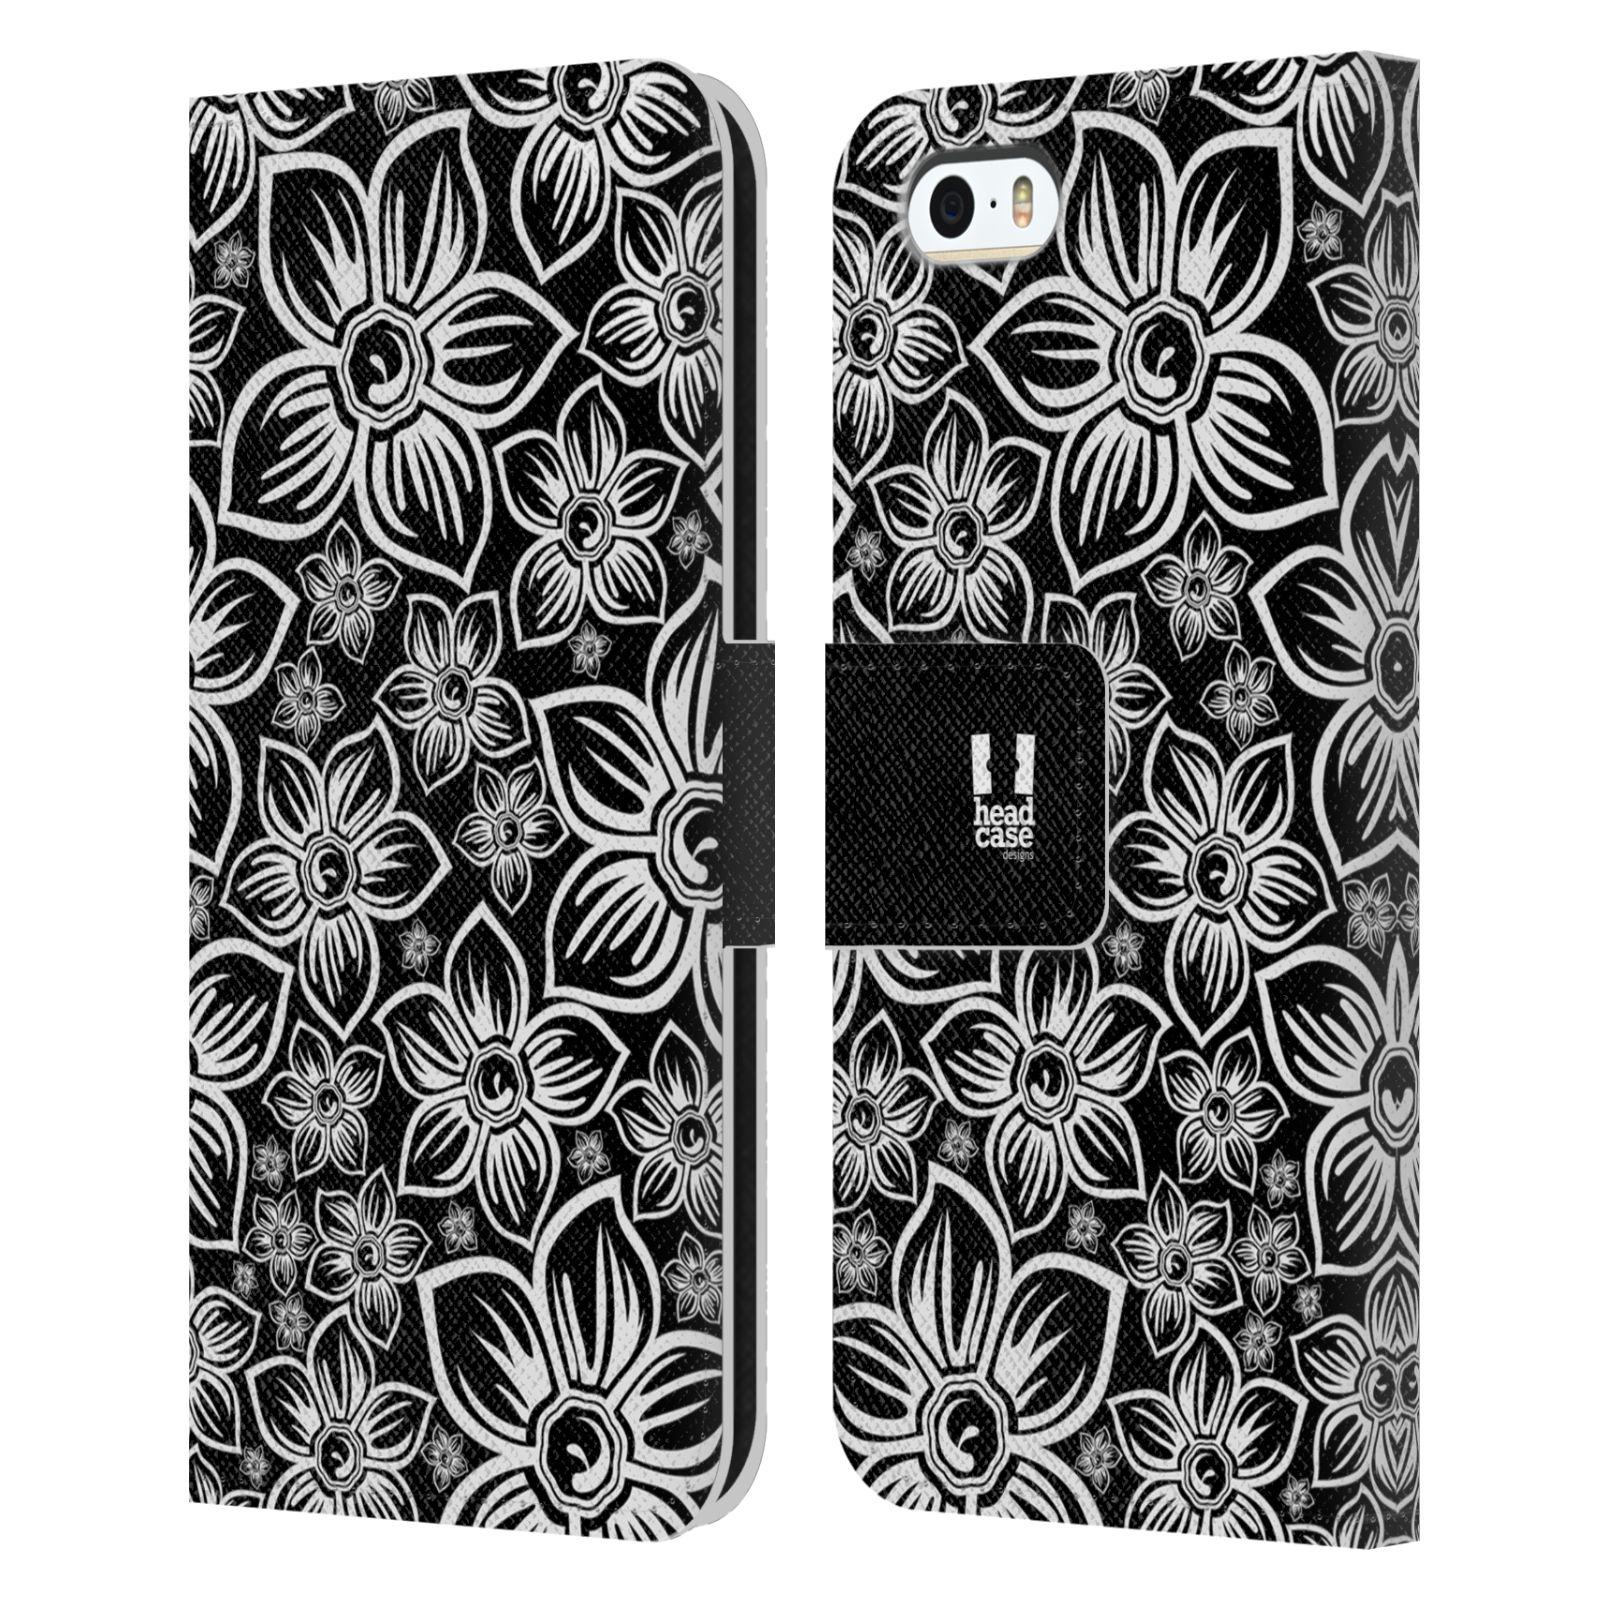 HEAD CASE Flipové pouzdro pro mobil Apple Iphone 5/5s ČERNOBÍLÁ KVĚTINA sedmikráska